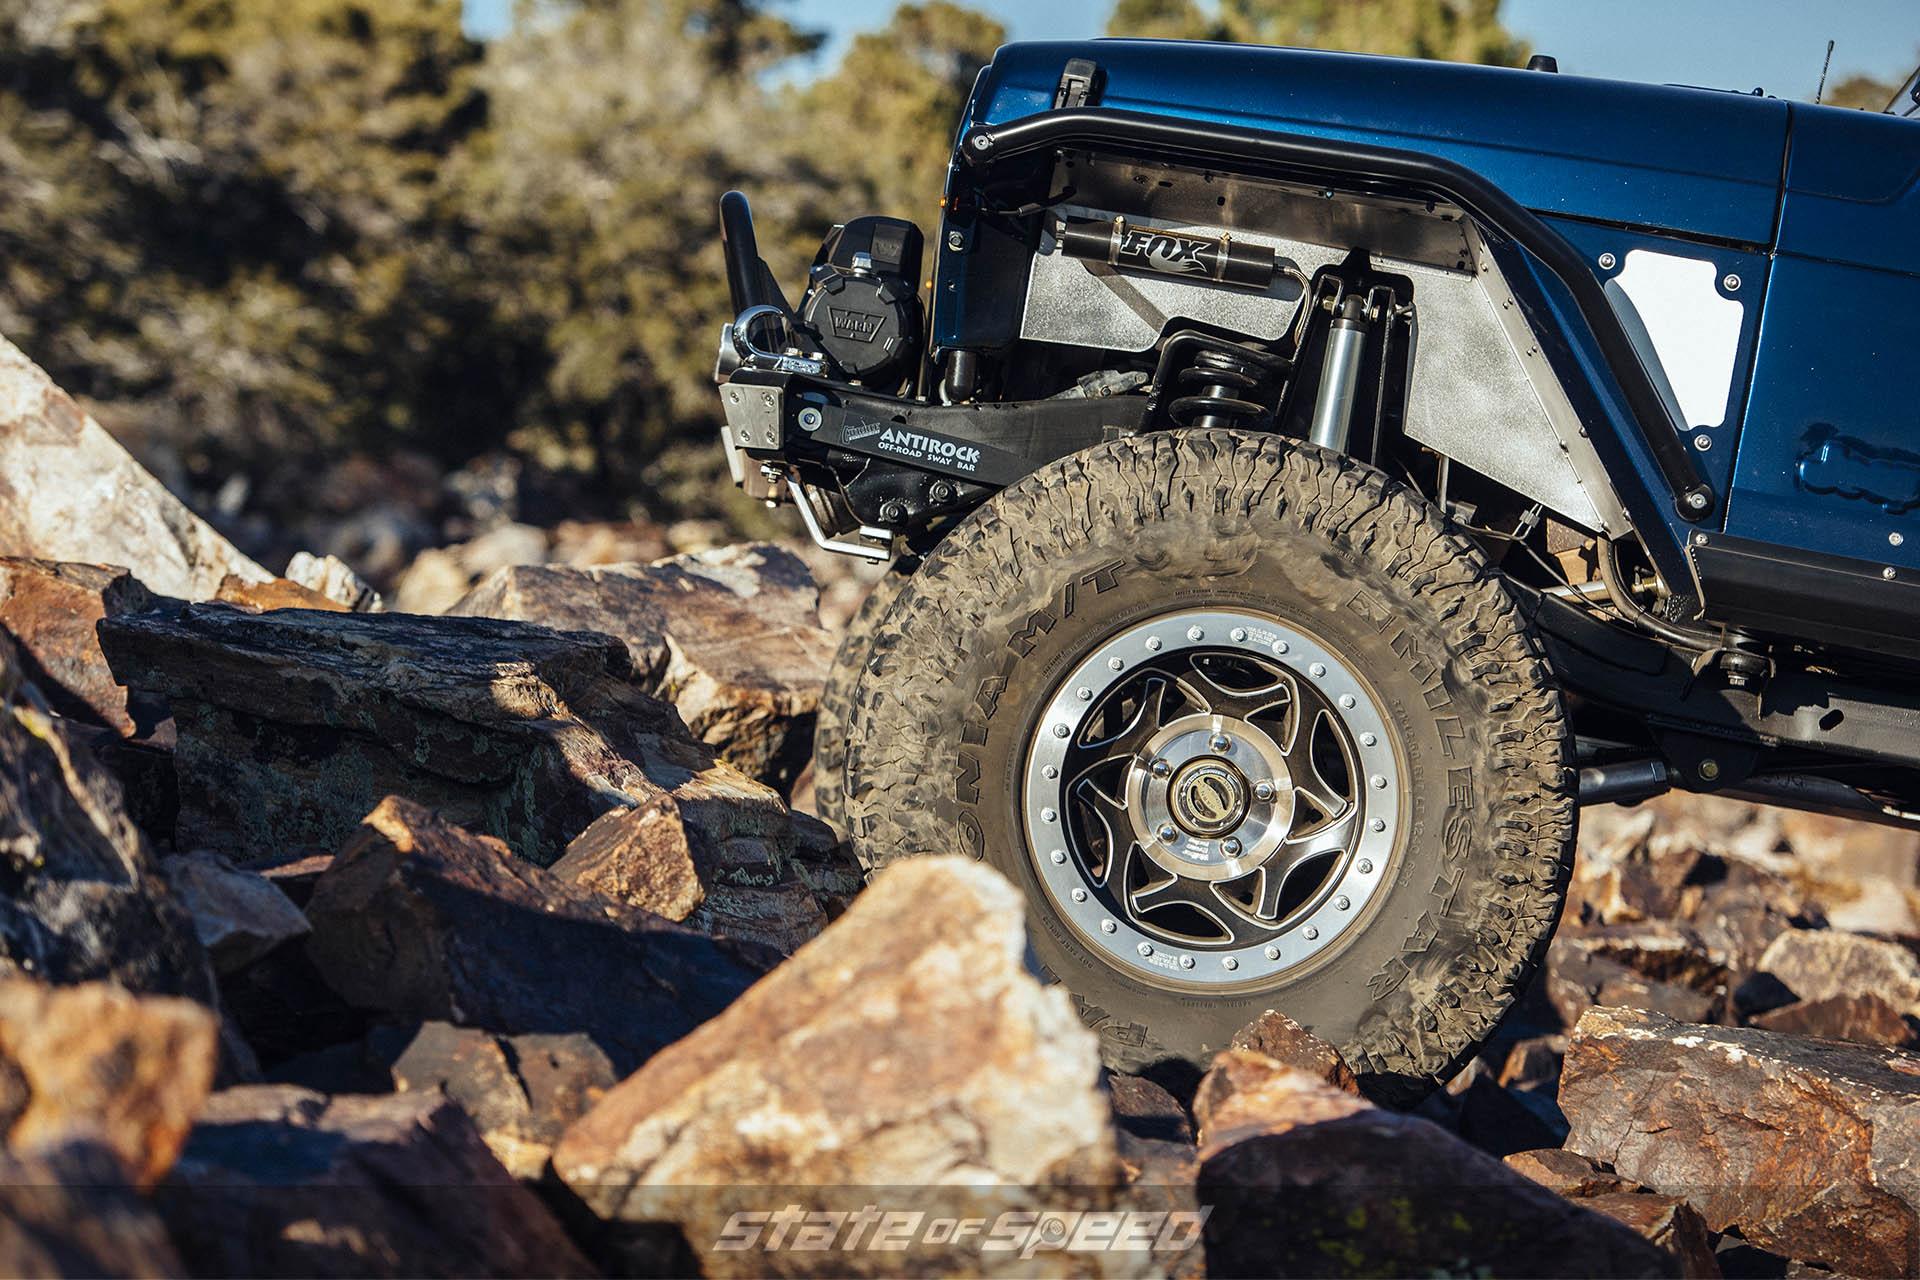 Jeep LJ Wrangler with Milestar Patagonia M/Ts